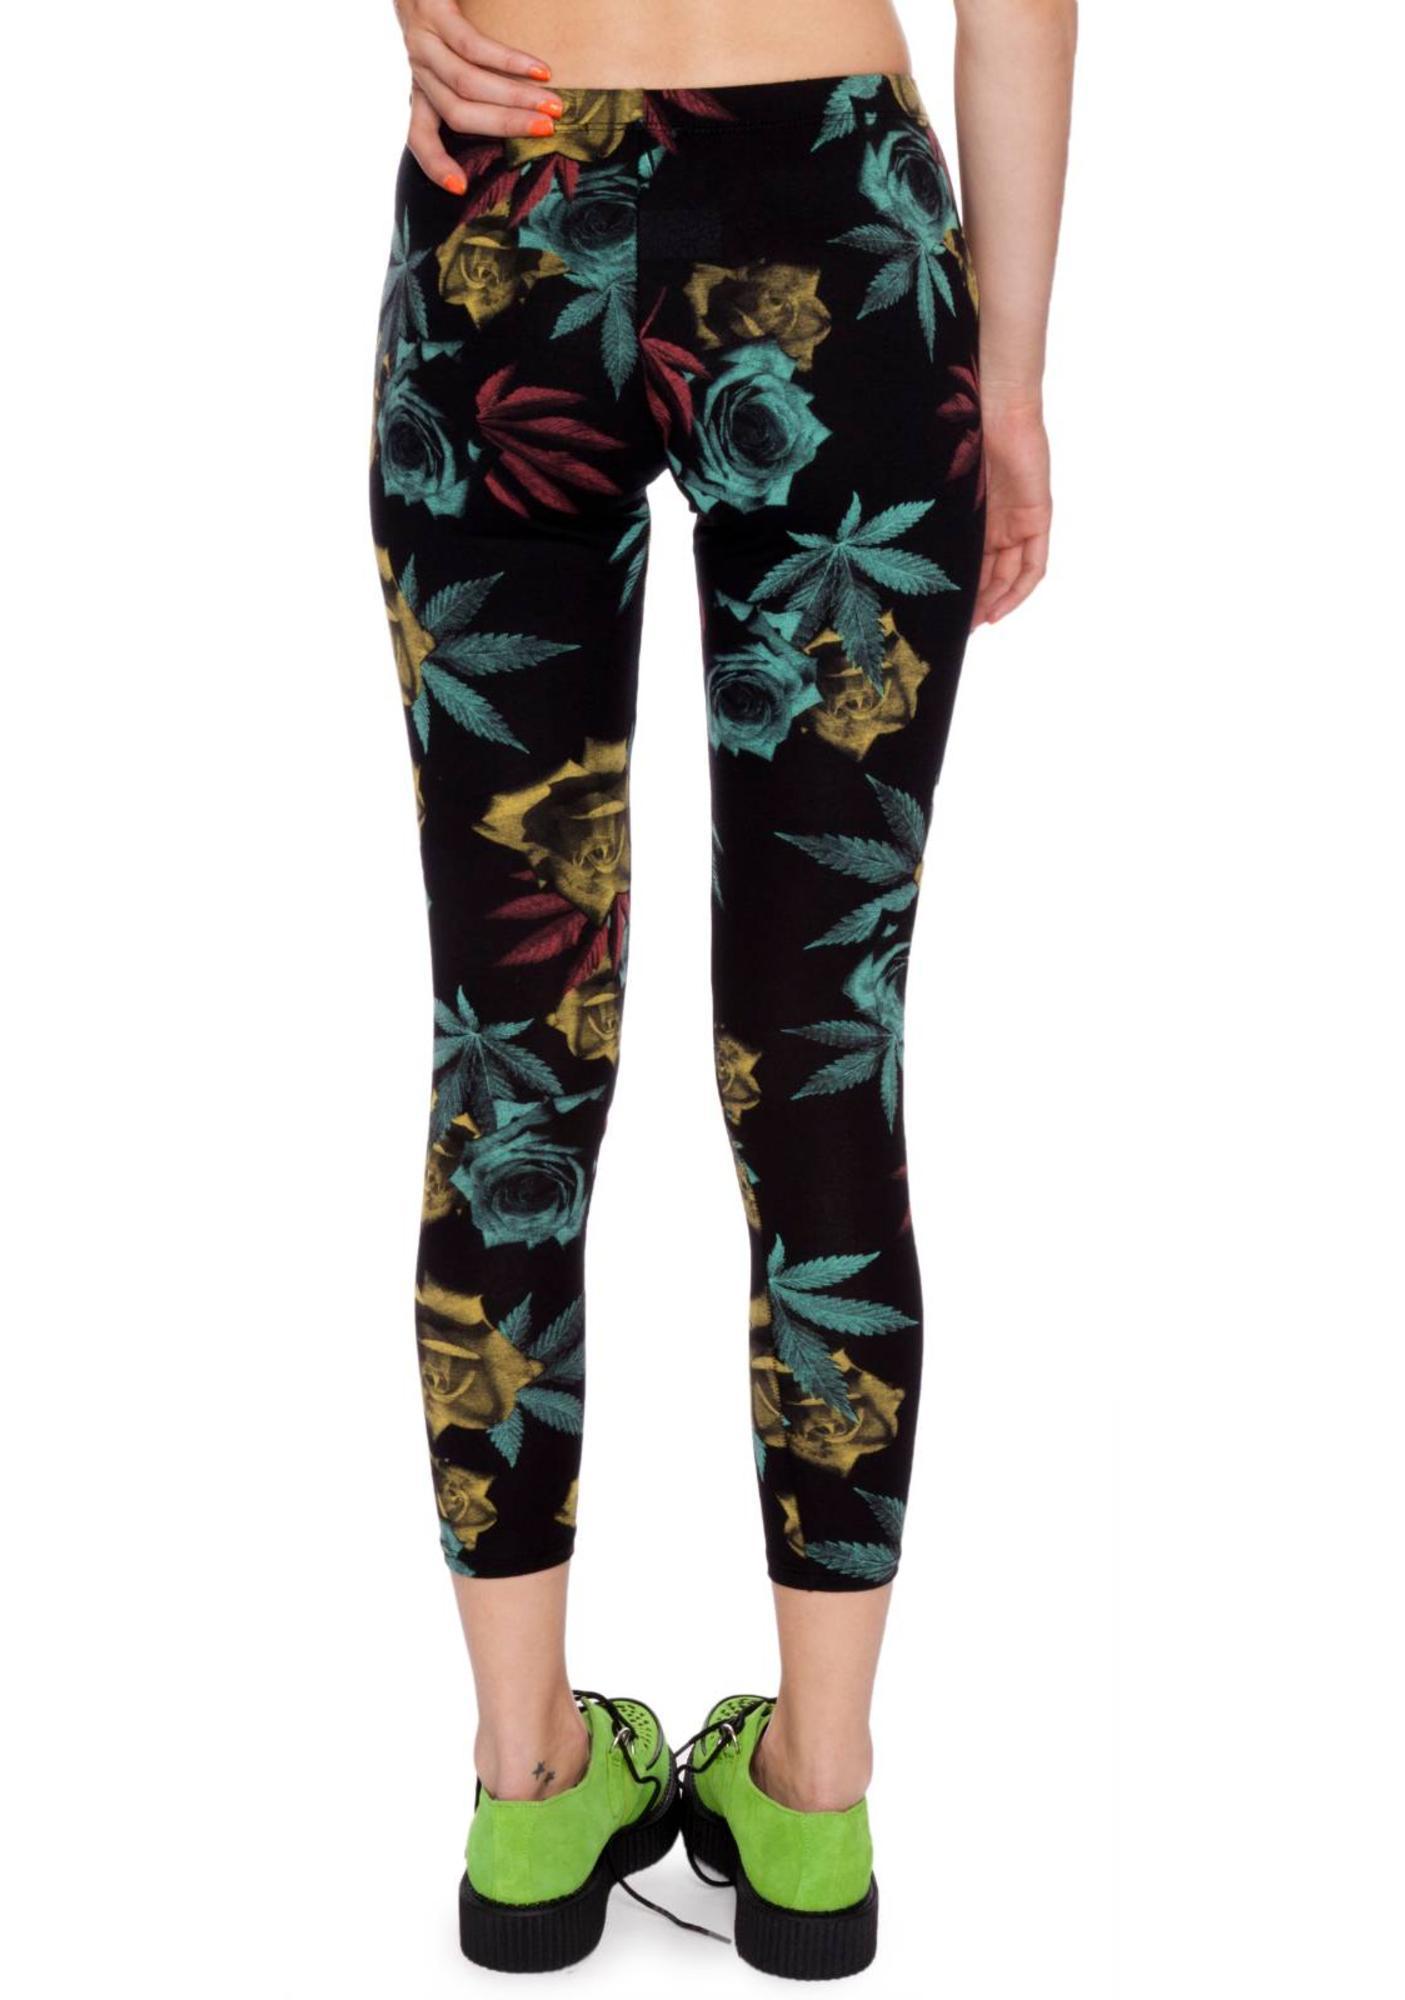 988fea6f9ea8b Dimepiece Weed & Rose Print Leggings | Dolls Kill